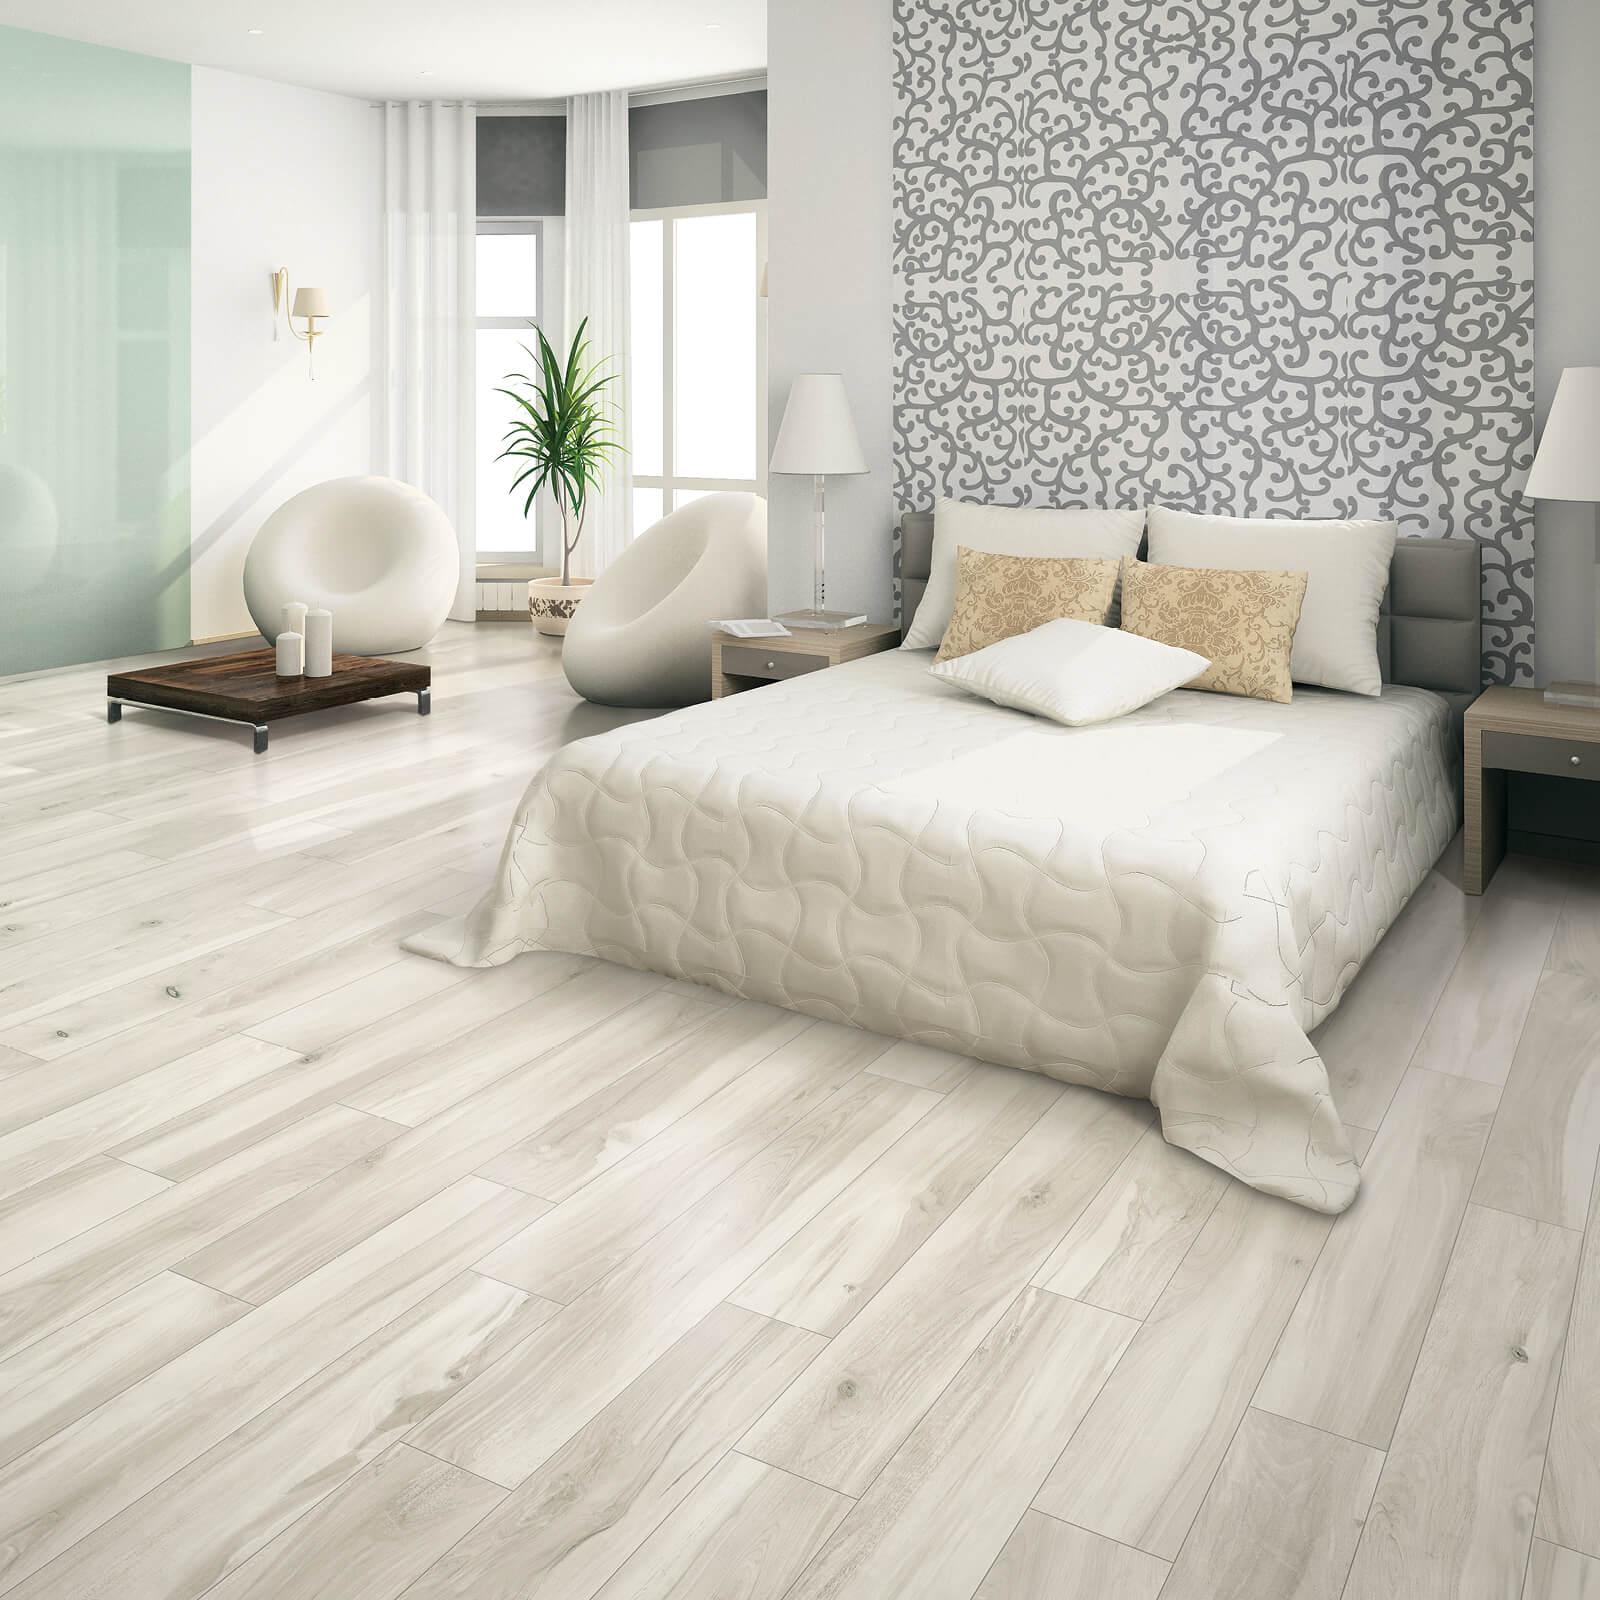 Tile in the Bedroom | Dalton Flooring Outlet